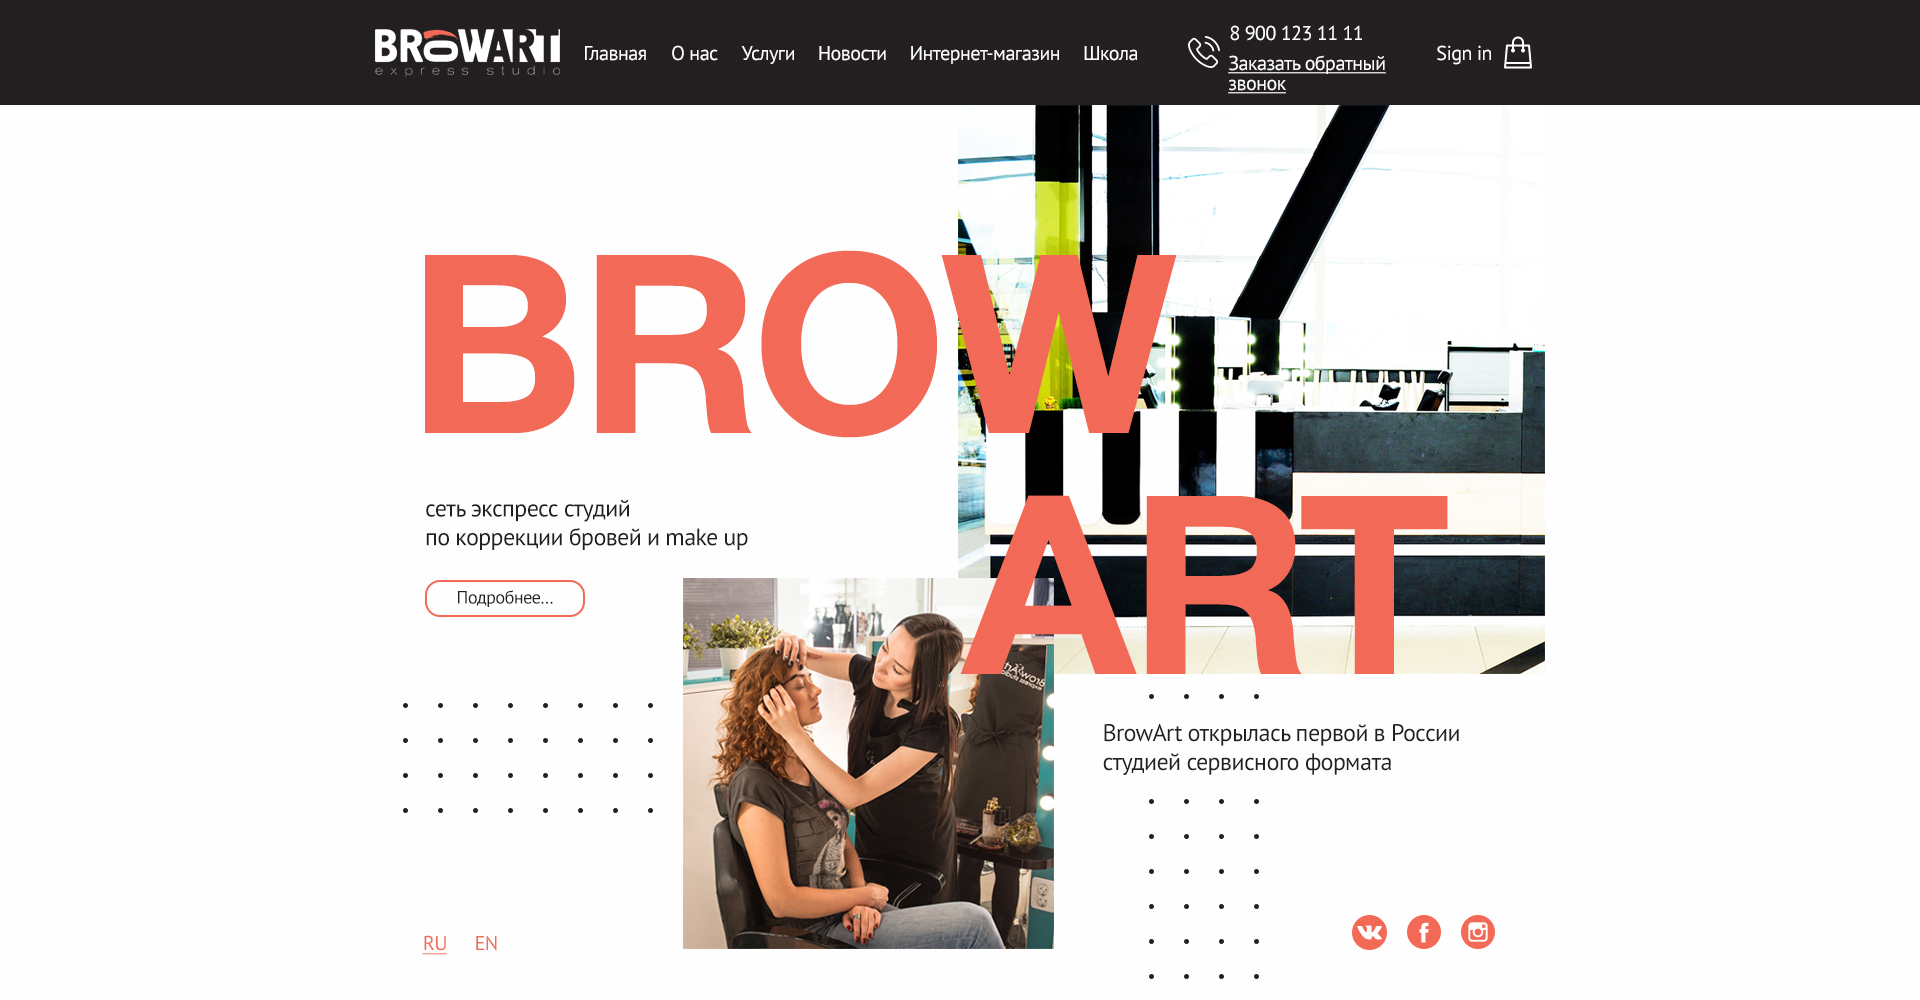 Дизайн сайта на основе готового прототипа-схемы и концепции фото f_9585a2464e5640a4.jpg